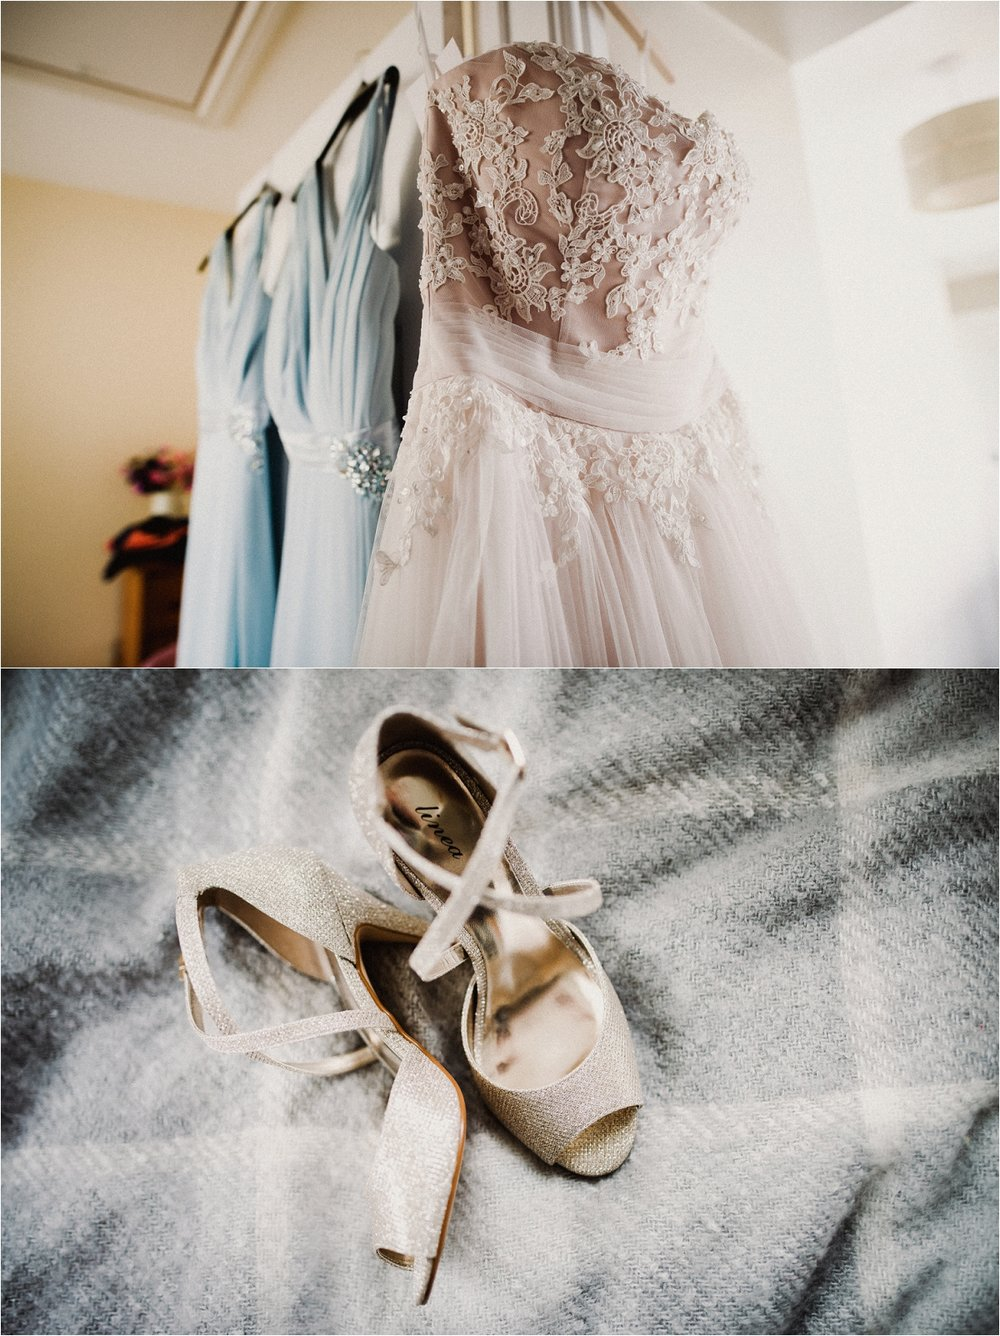 chris_emma_wedding_the_Fleece_inn_0007.jpg